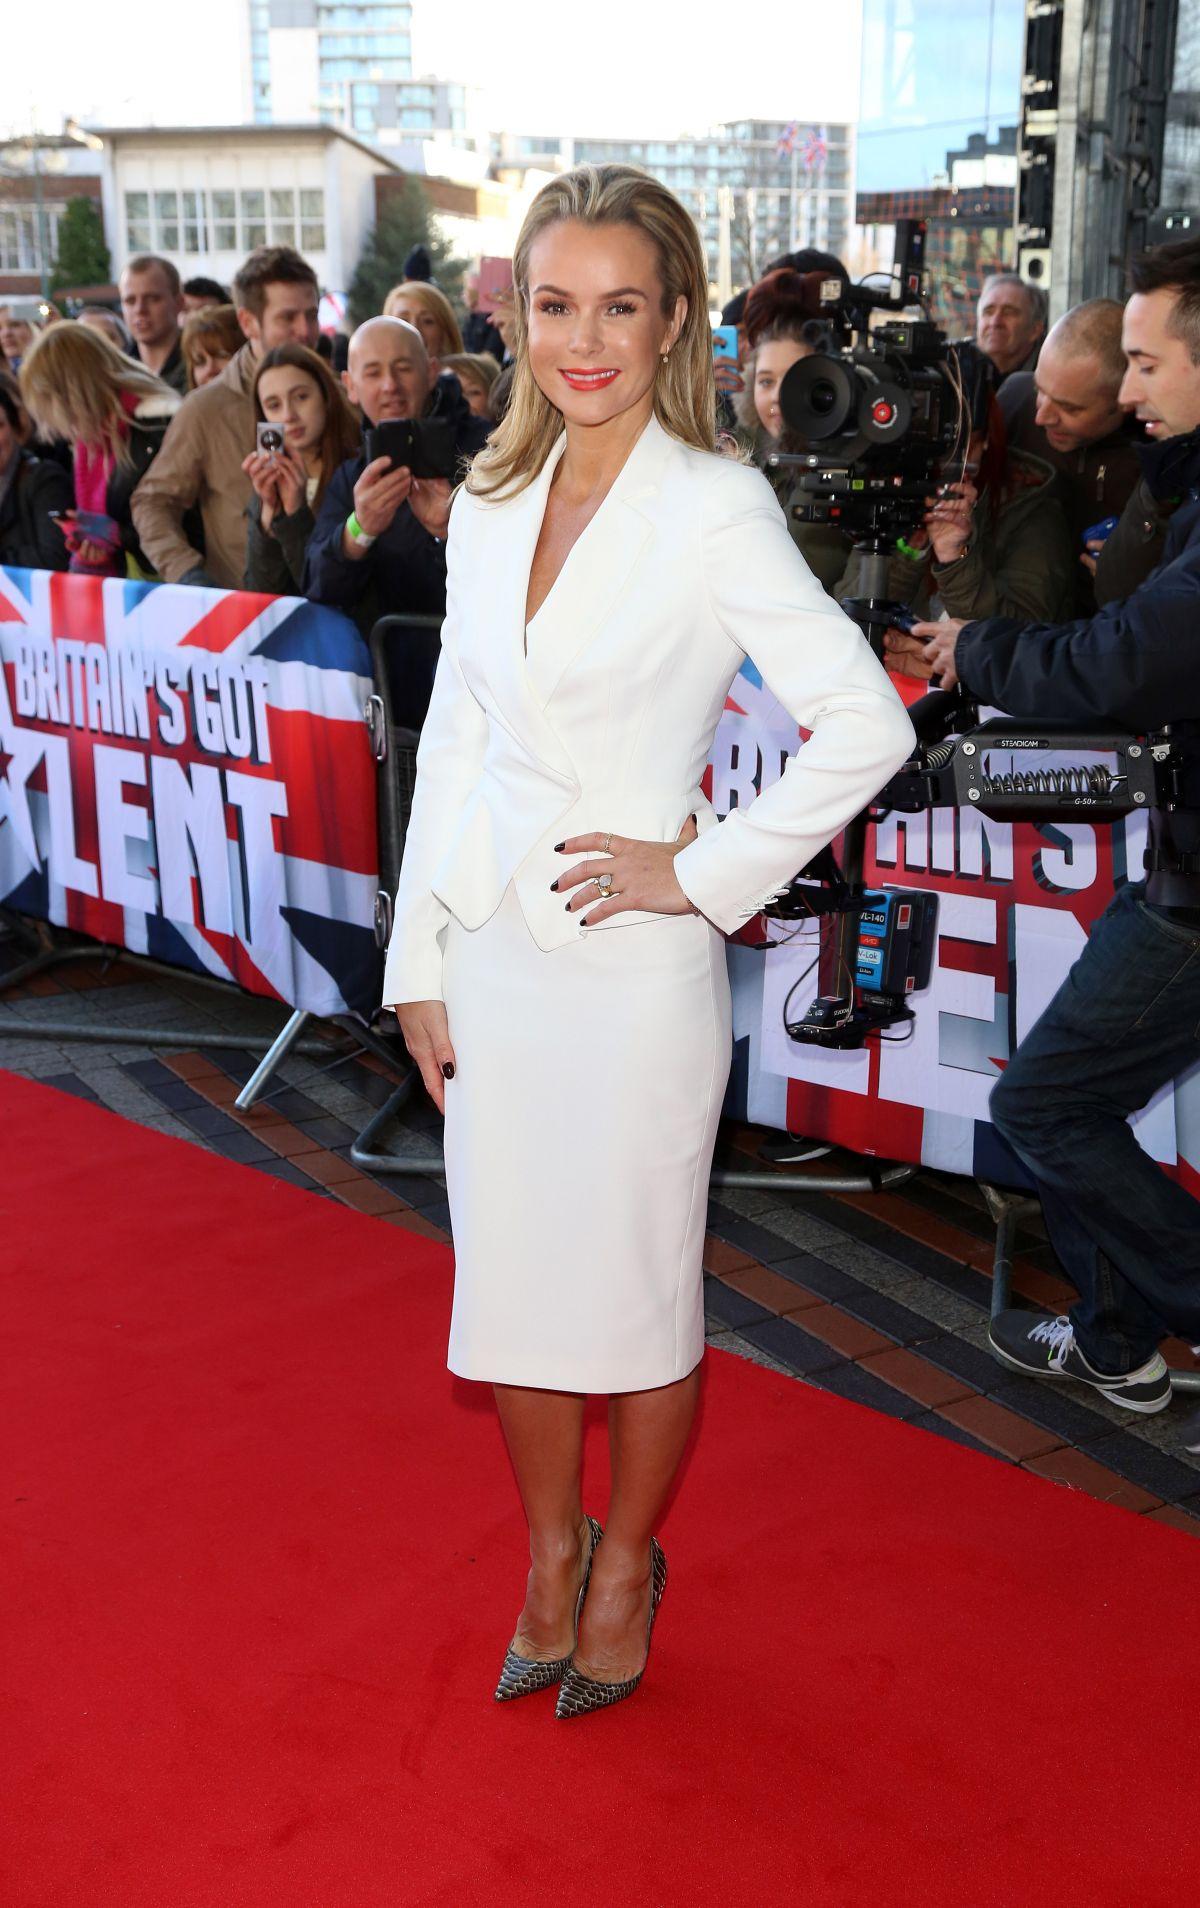 AMANDA HOLDEN at Britain